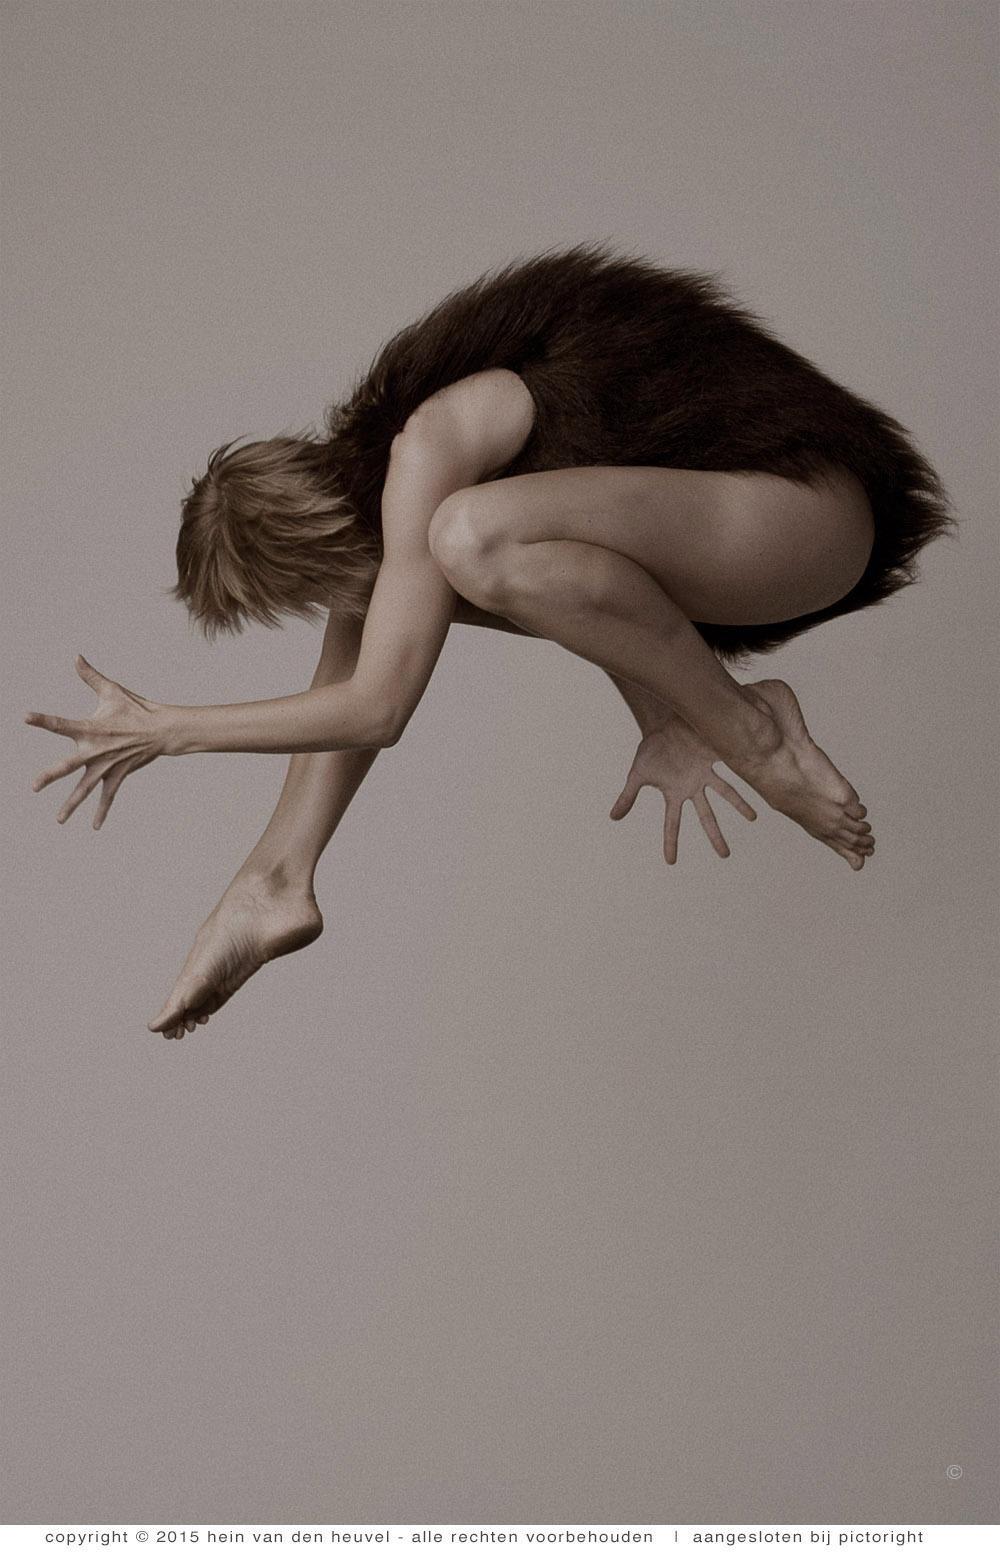 FlyingBirds-AletPilon-studiofotografie-kunst.jpg